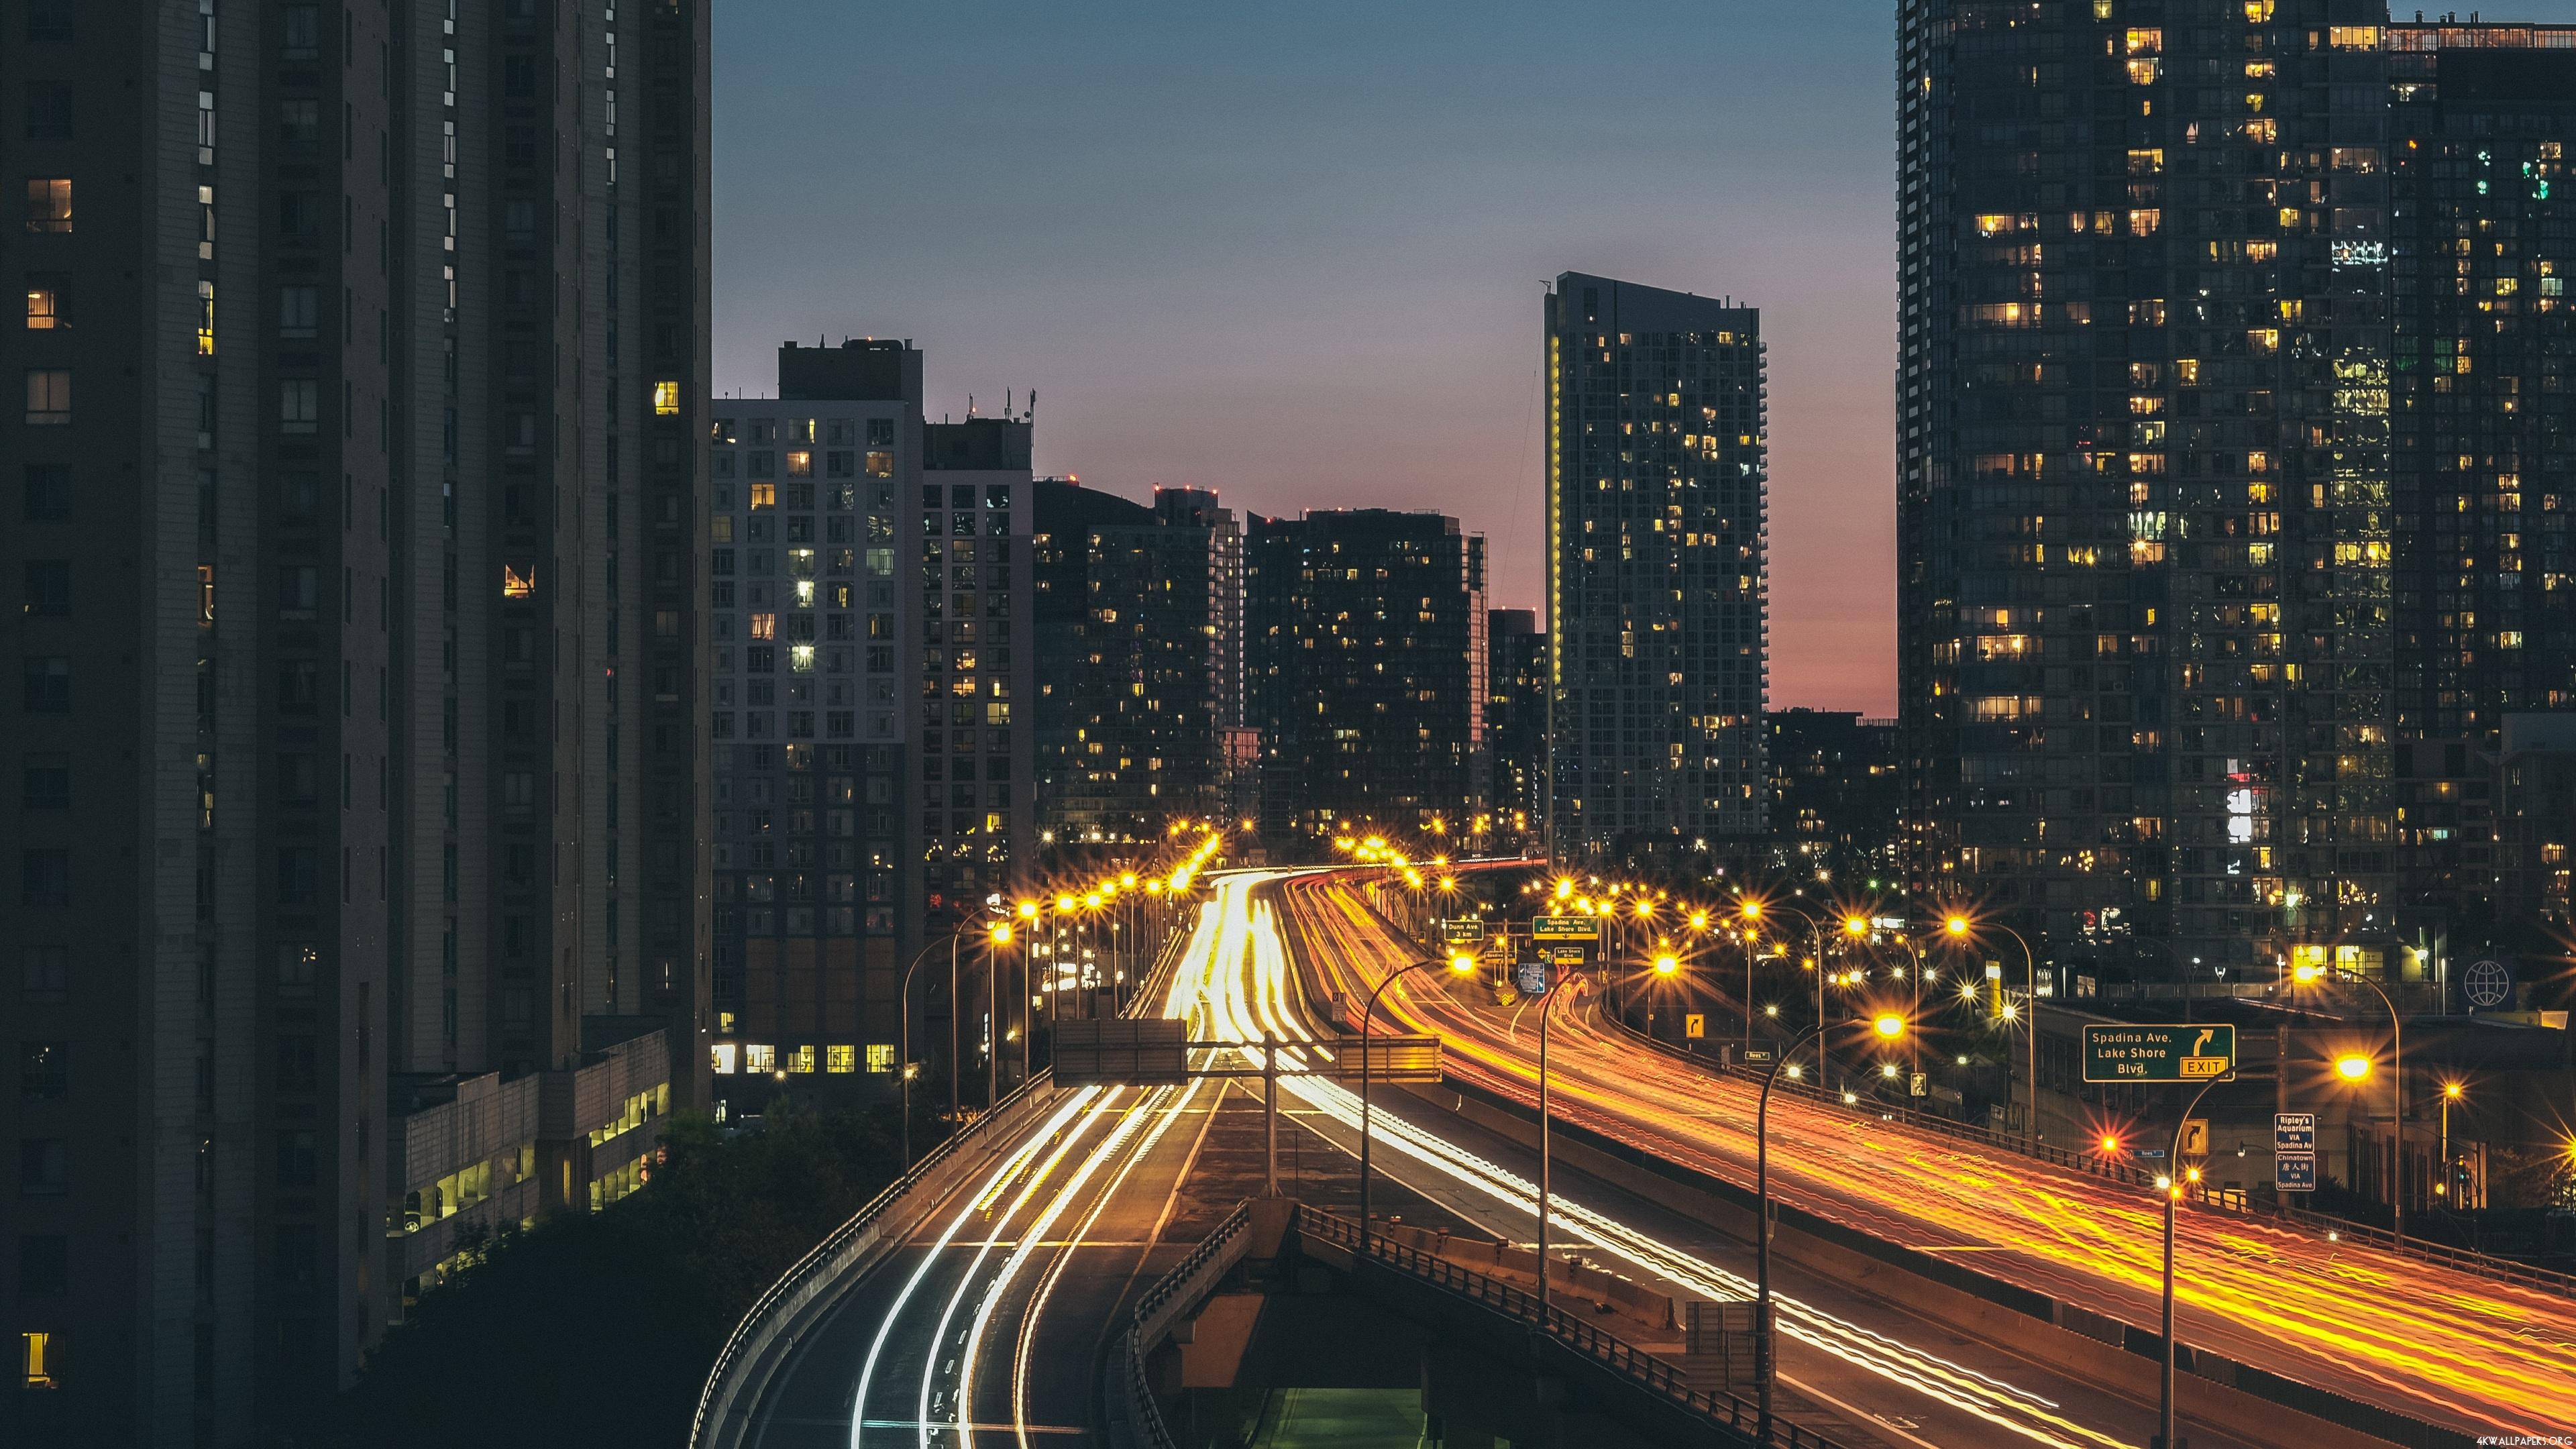 4K City At Night Wallpaper | ID: 263